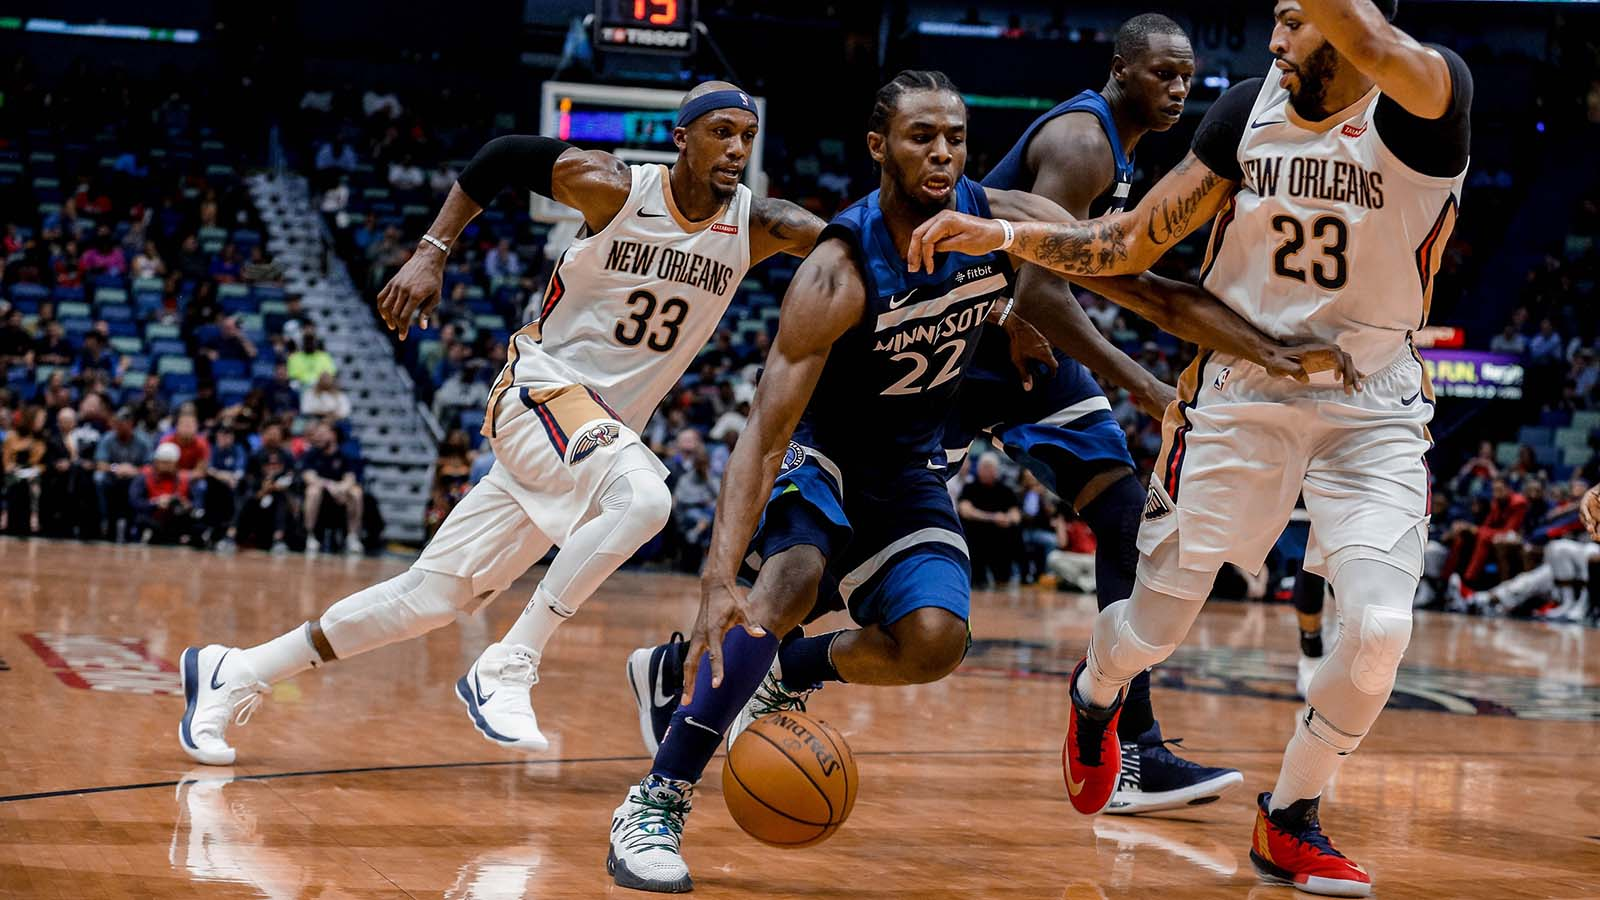 Wolves Twi-lights: Wiggins spins through Pelicans defense